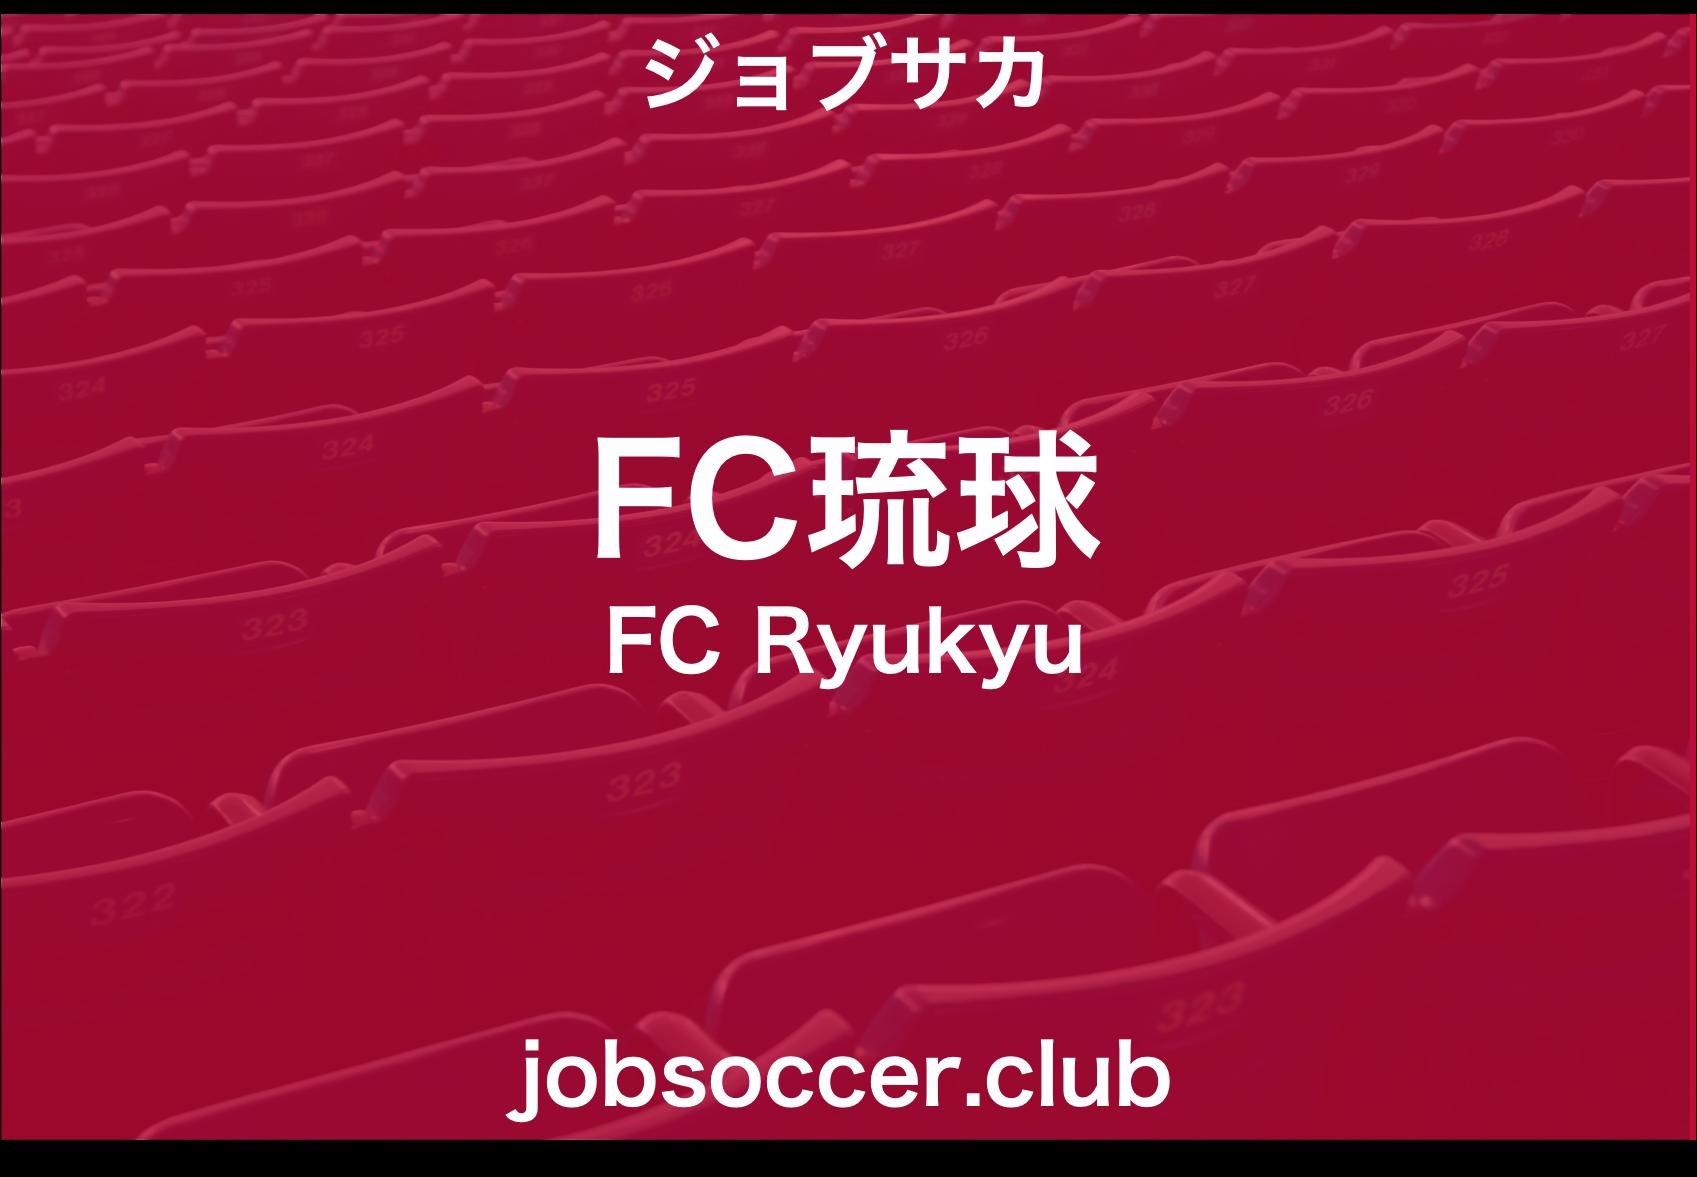 FC琉球 求人情報